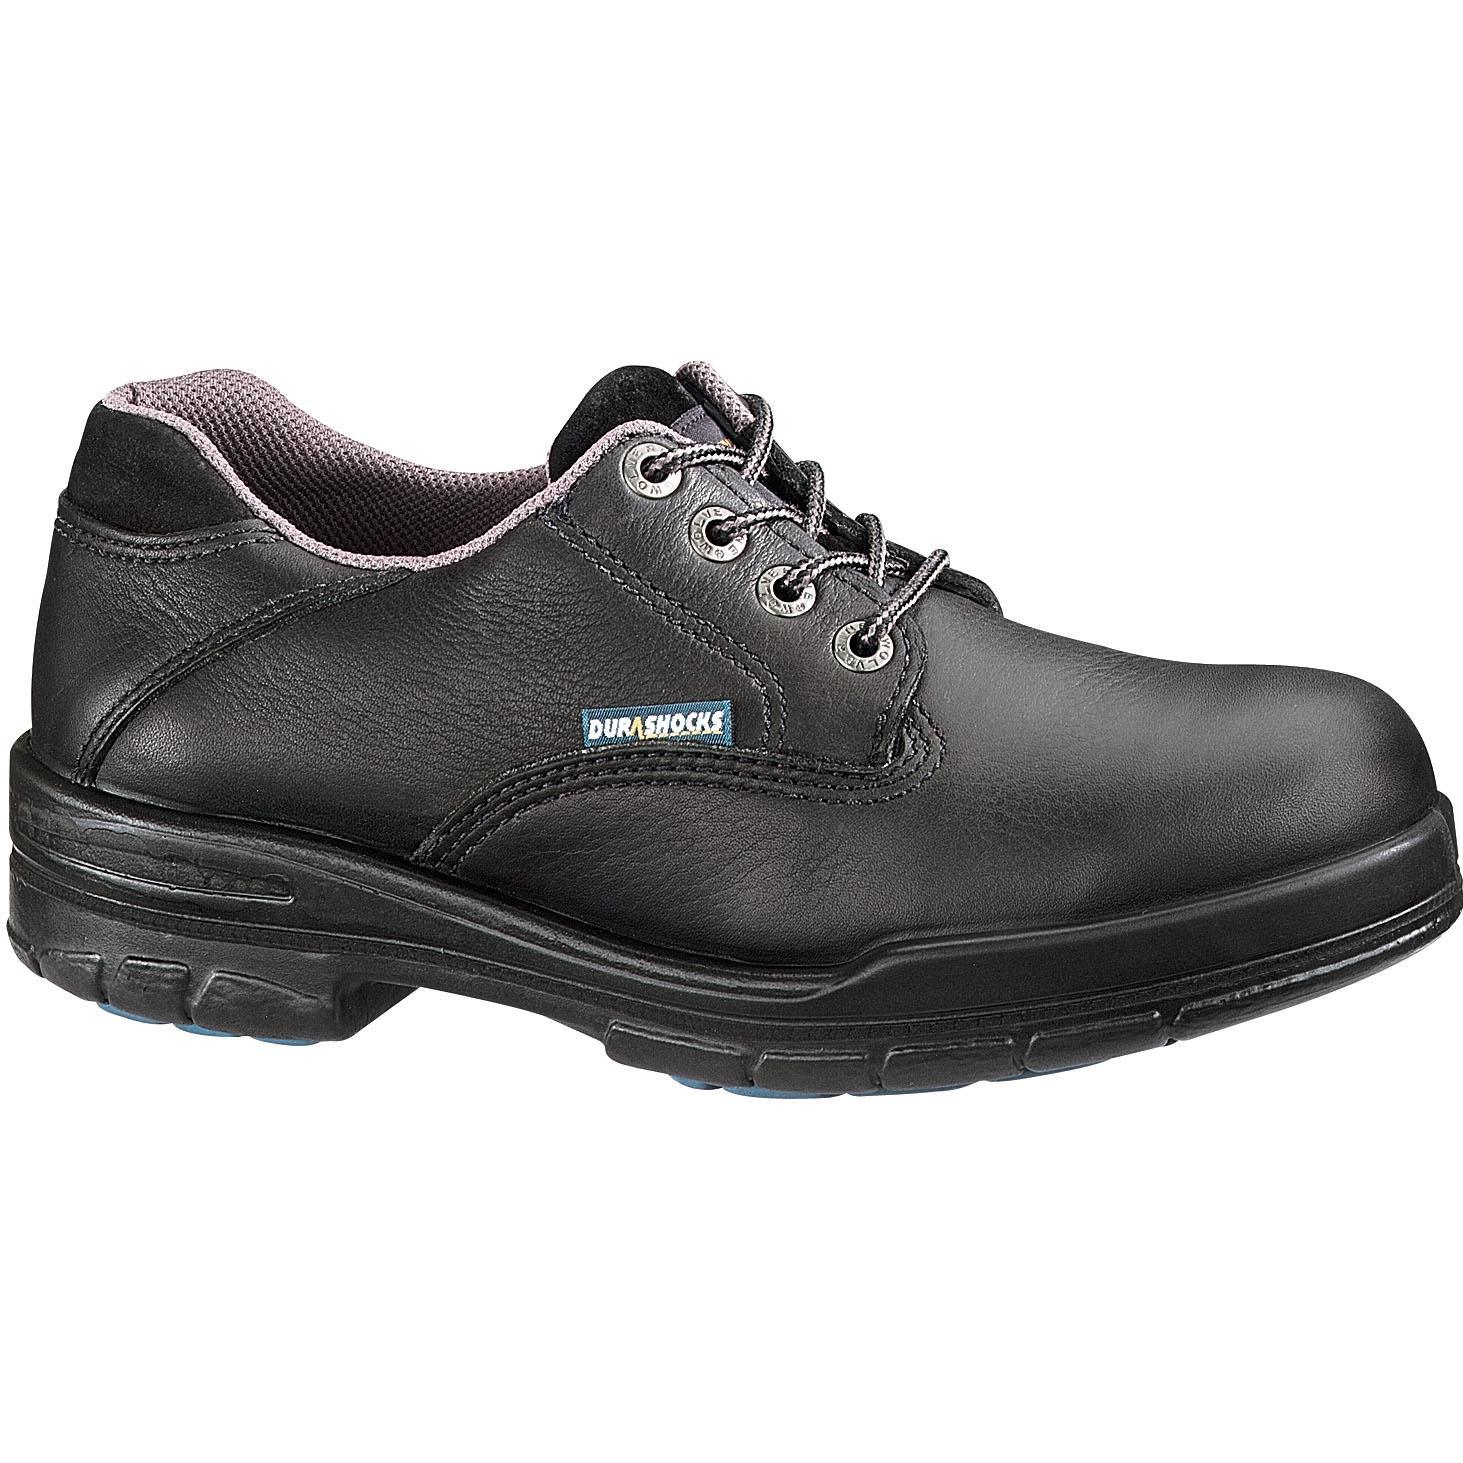 Wolverine Mens Durashocks SR Oxford Work Shoes - Black - Size 7 - Wide